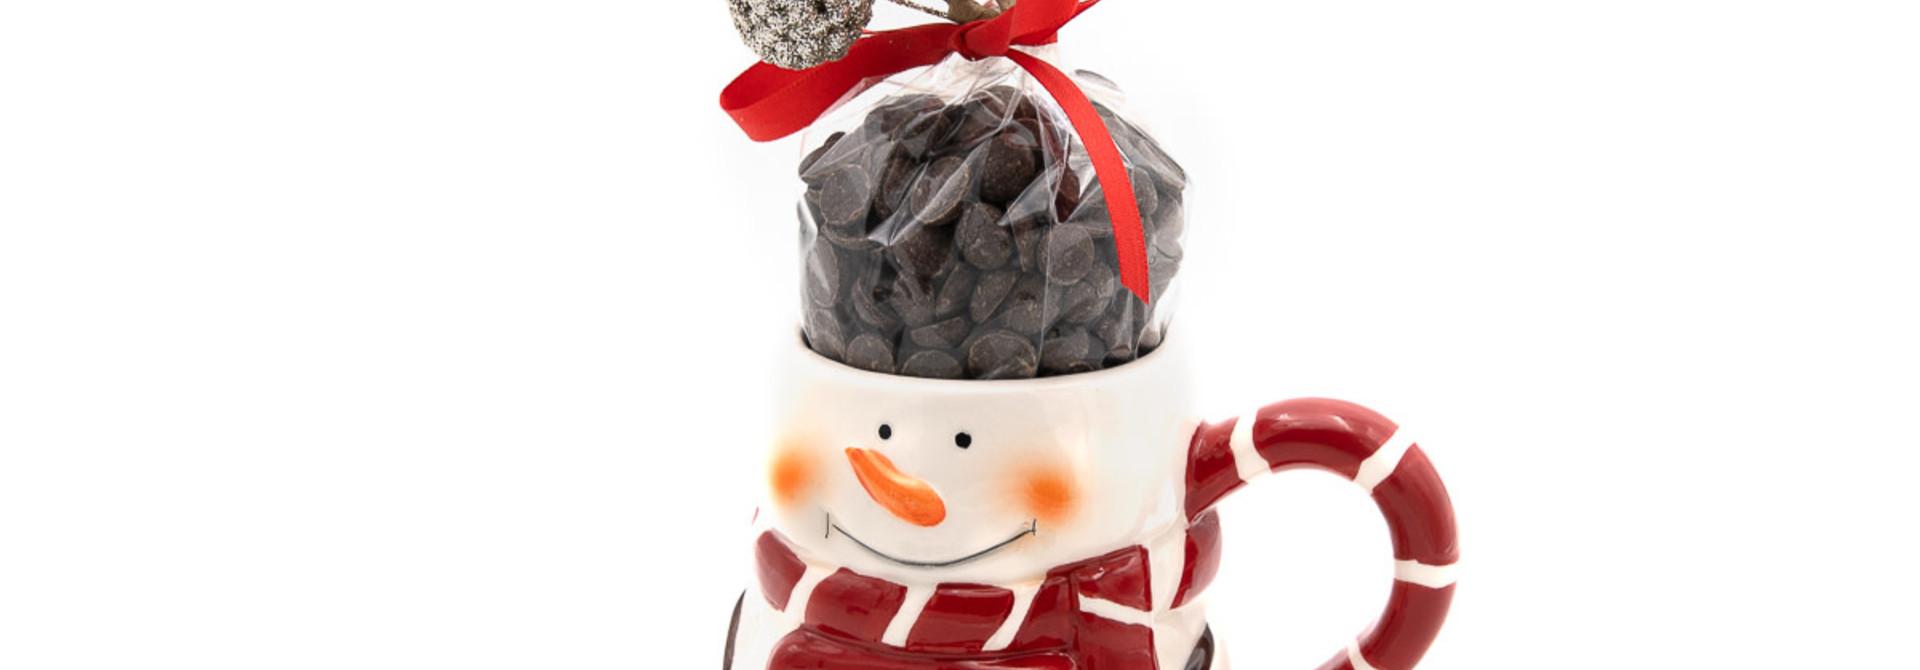 Hot dark chocolate in cup (snowman)